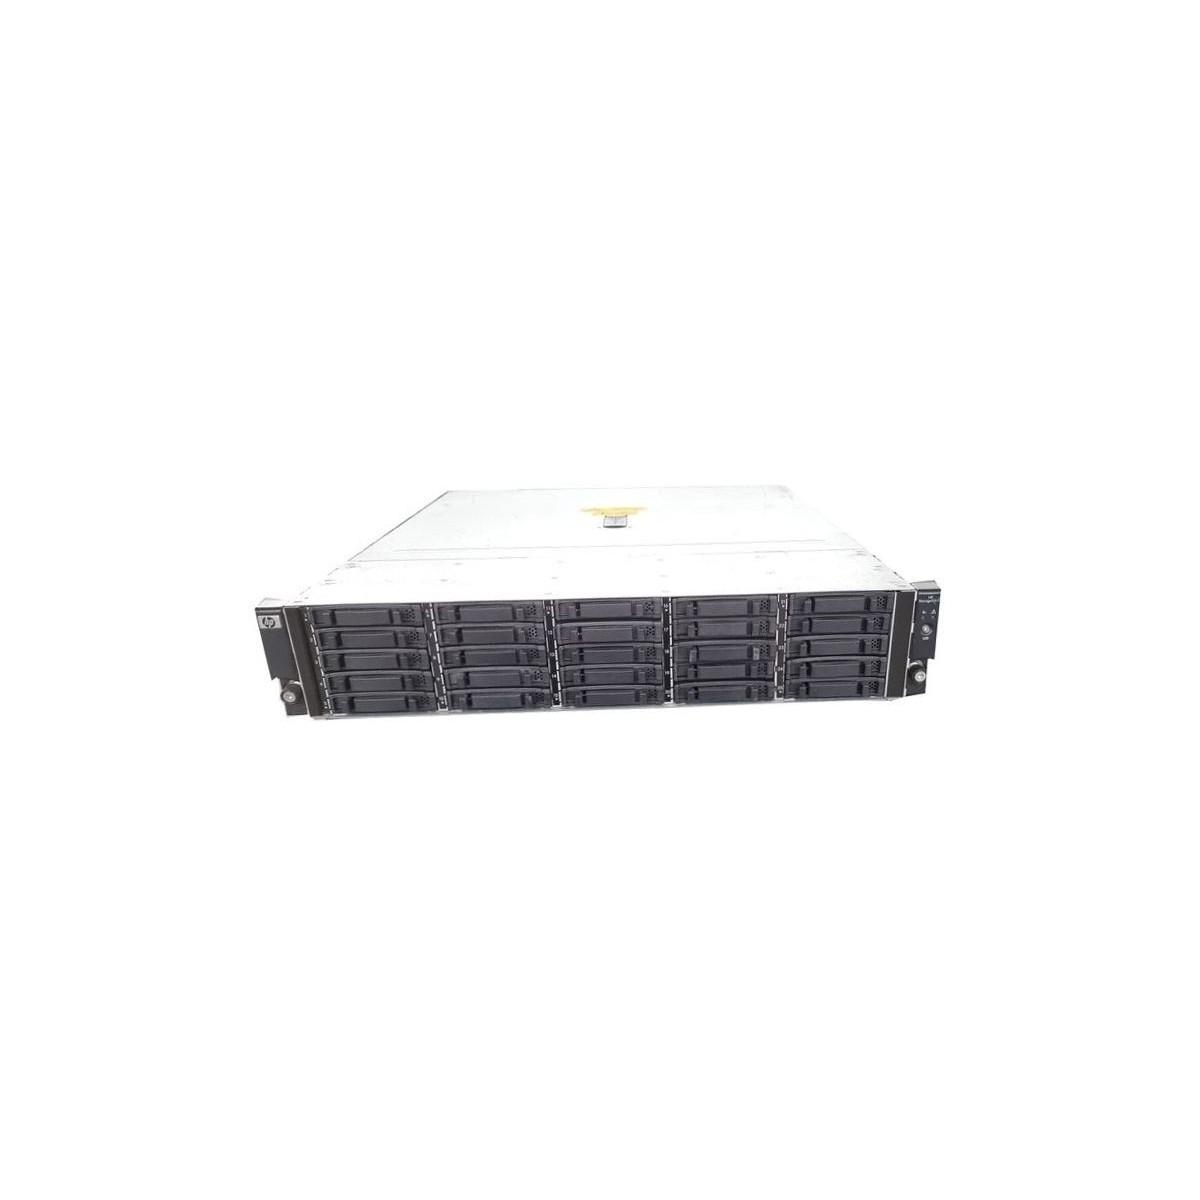 PAMIEC SAMSUNG 4GB PC3L-10600R M393B5270DH0-YH9